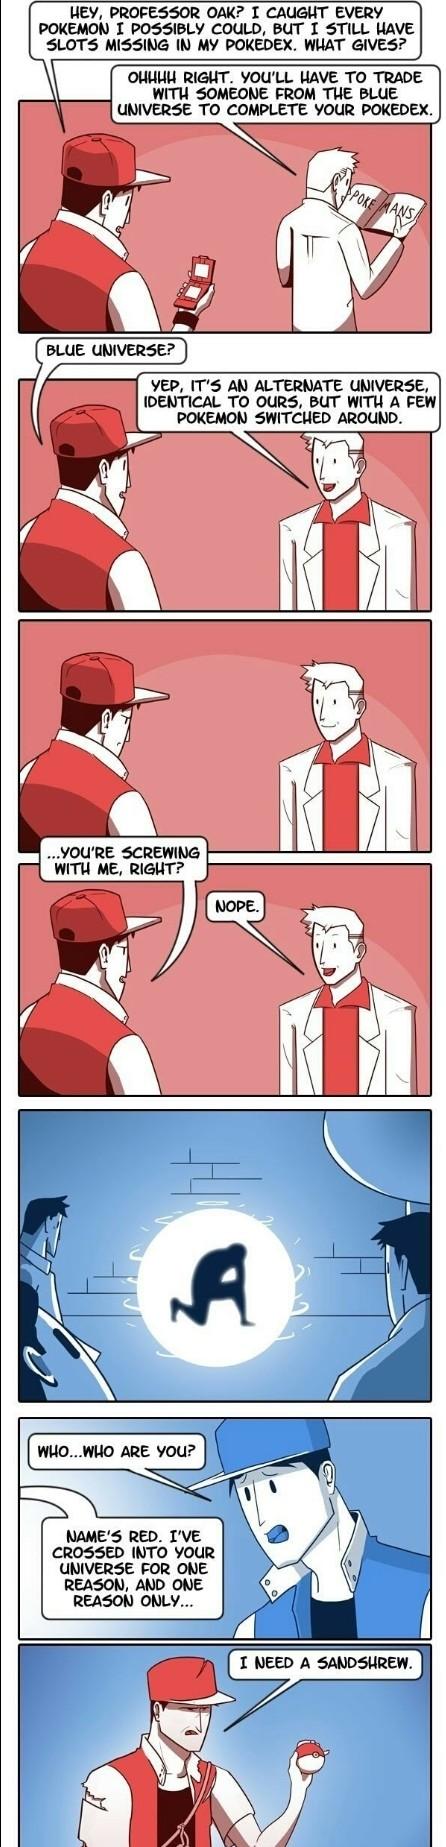 Version differences. .. That's a pretty cool concept Pokemon